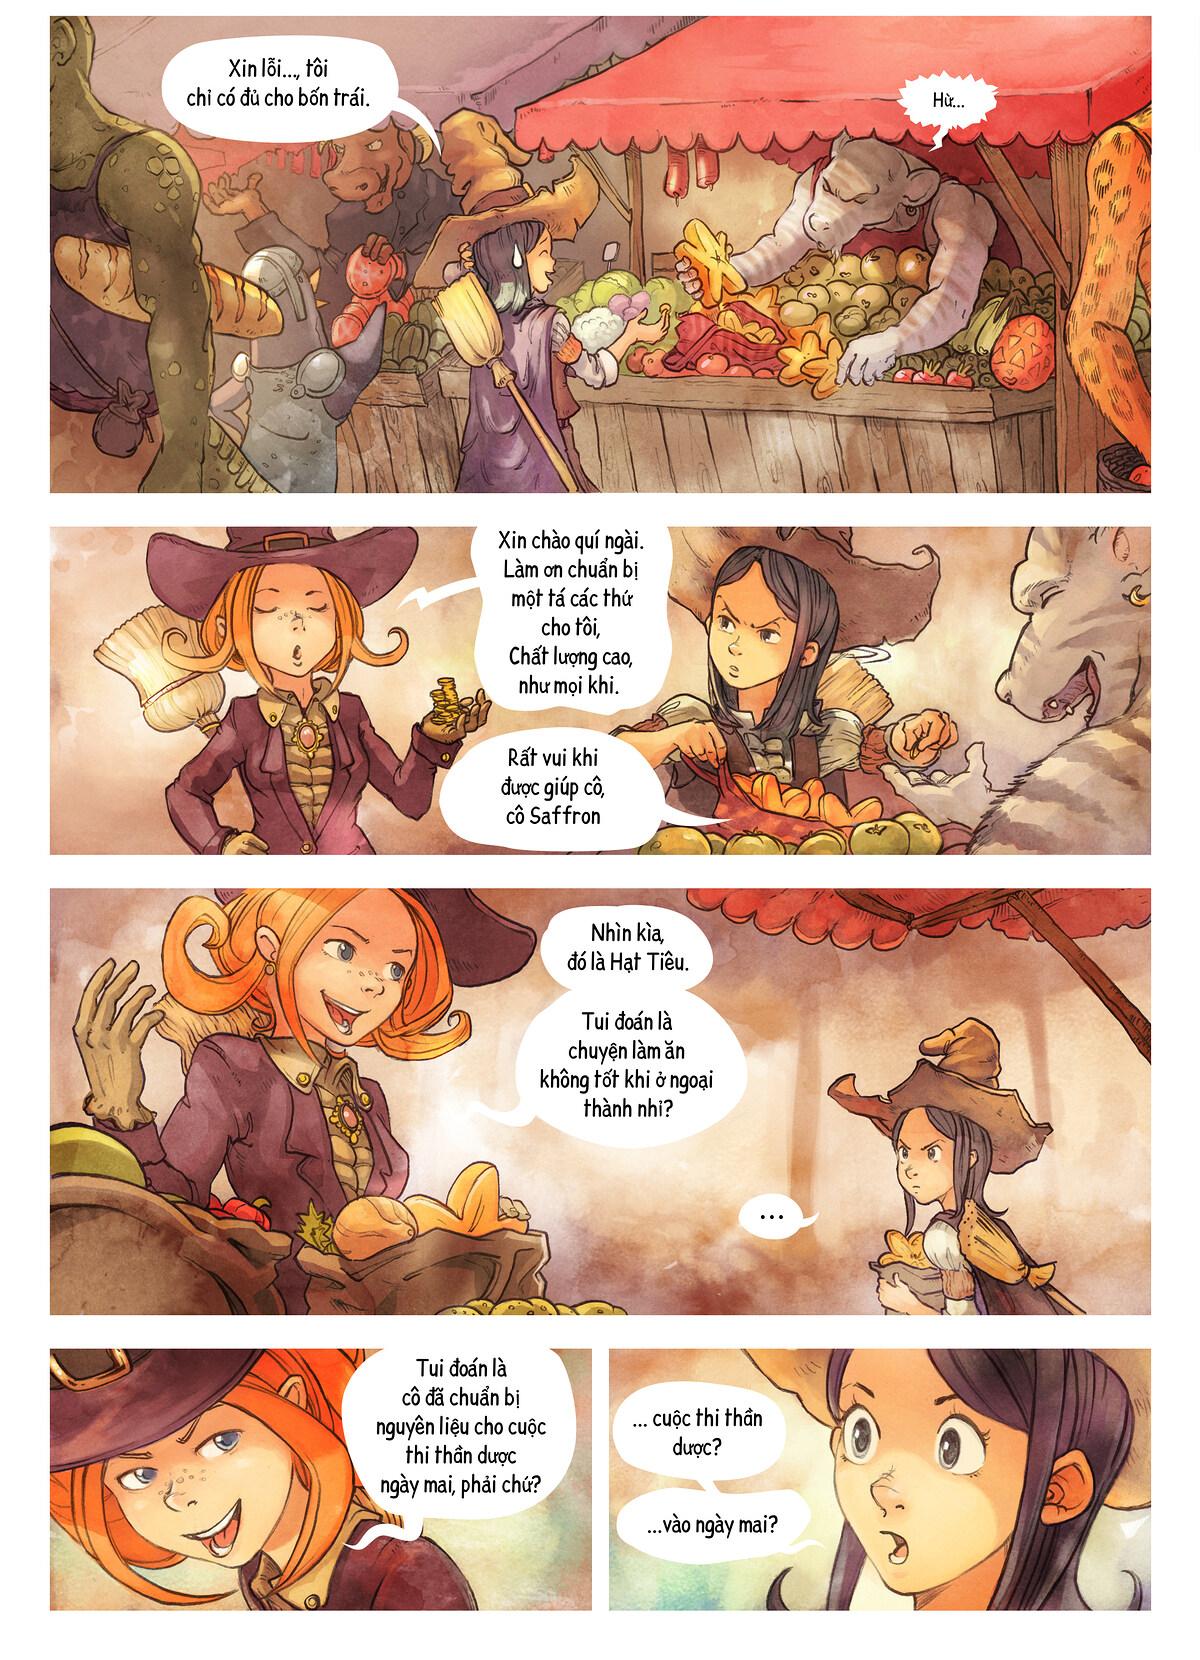 A webcomic page of Pepper&Carrot, Tập 3 [vi], trang 2